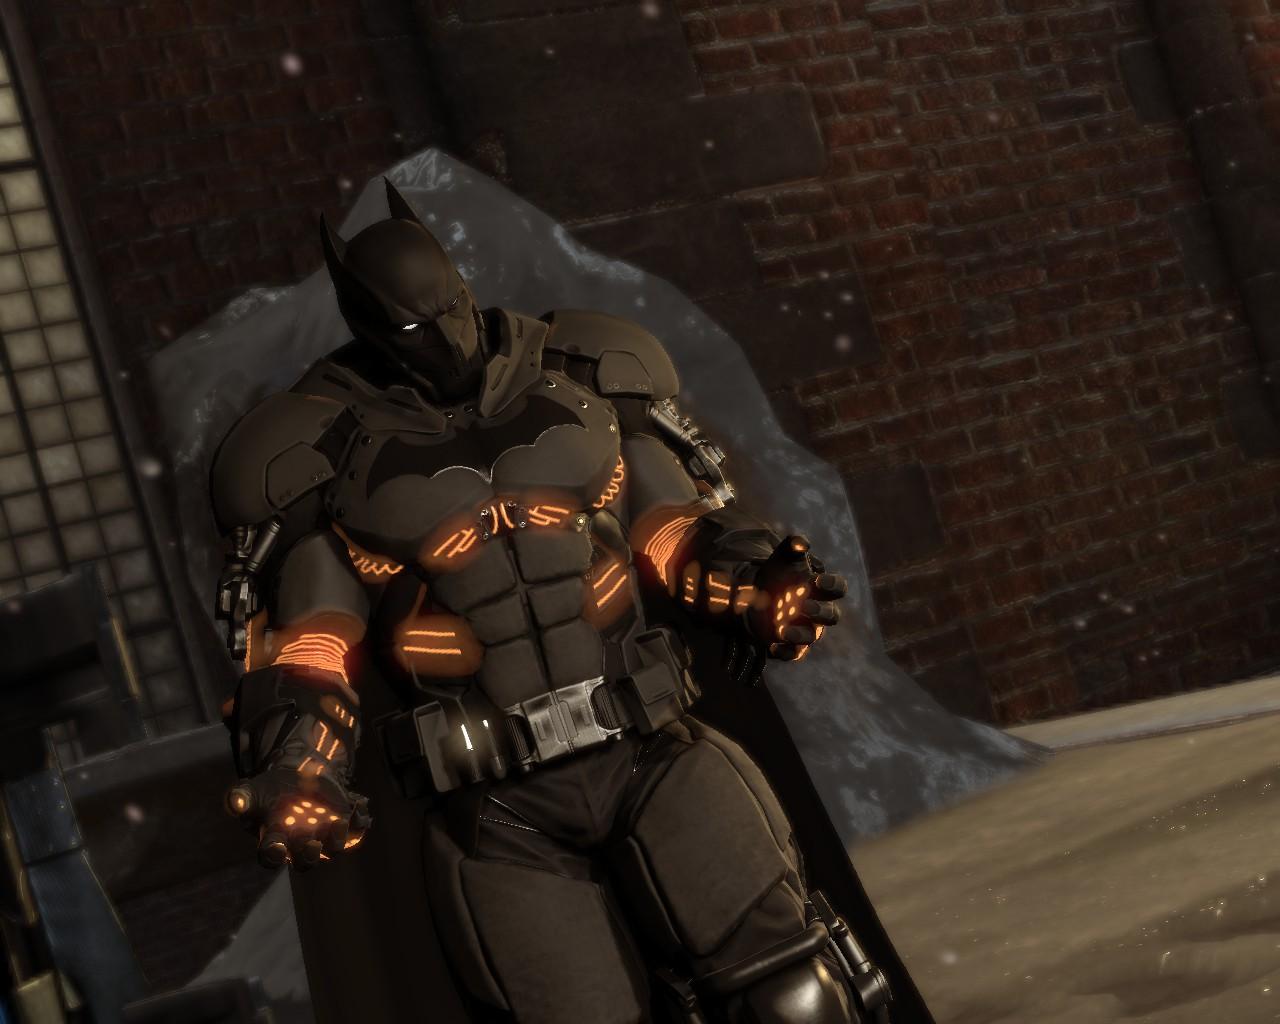 BatmanOrigins 2014-07-13 01-19-34-91.jpg - Batman: Arkham Origins